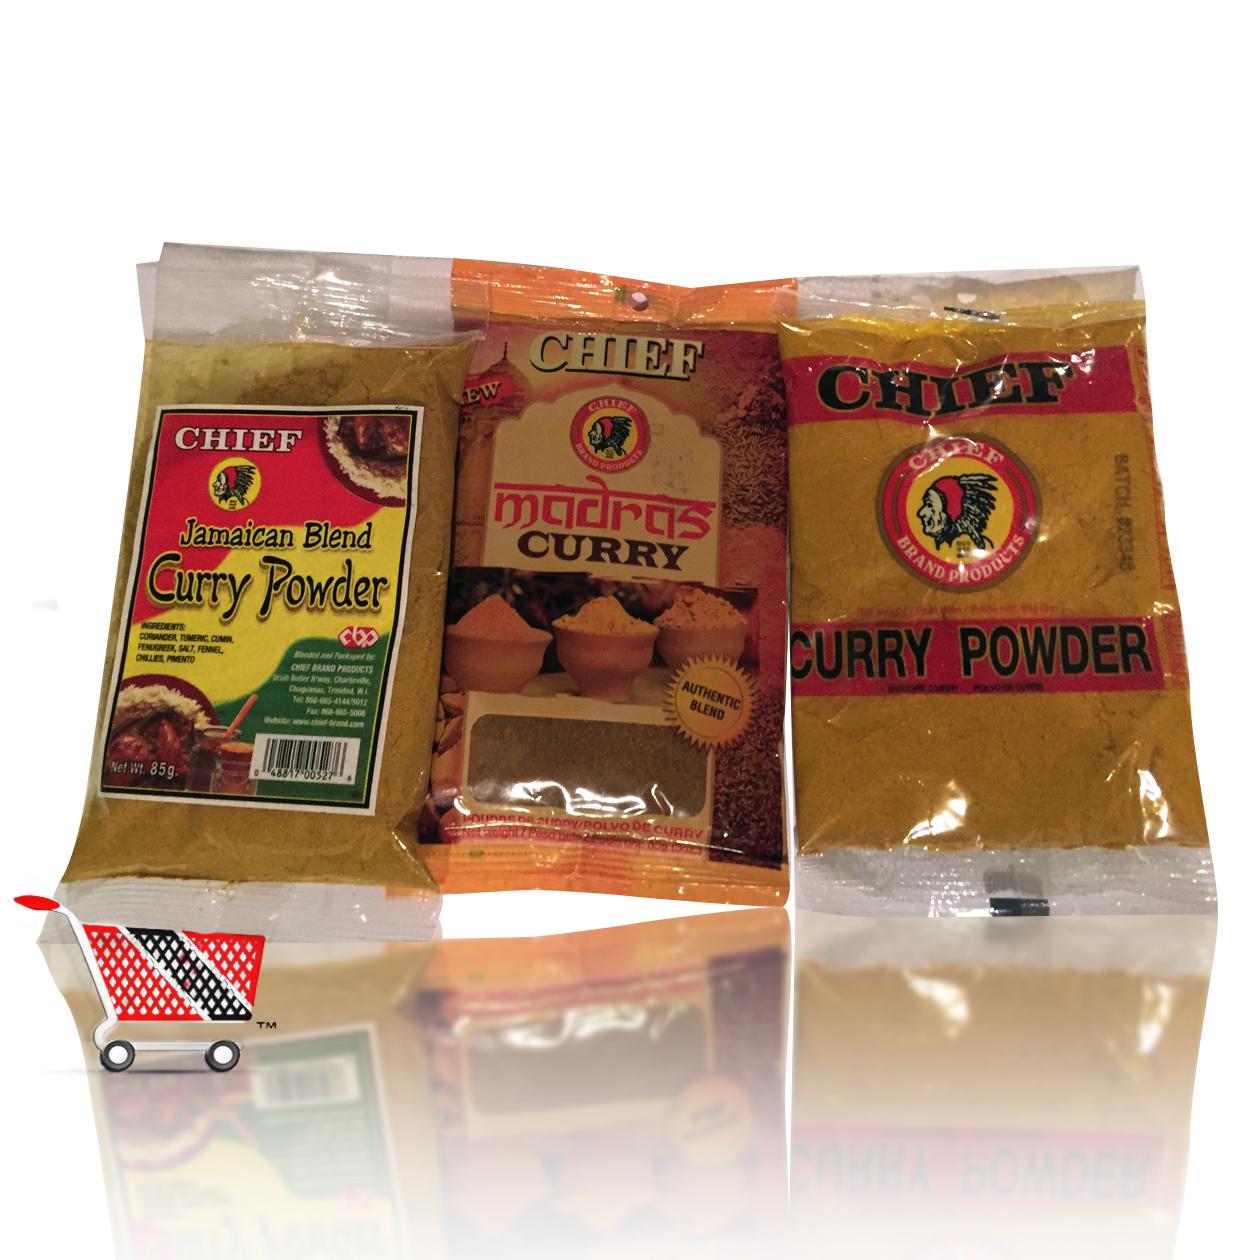 mytrinigrocery-product-reflection-currypowder.jpg